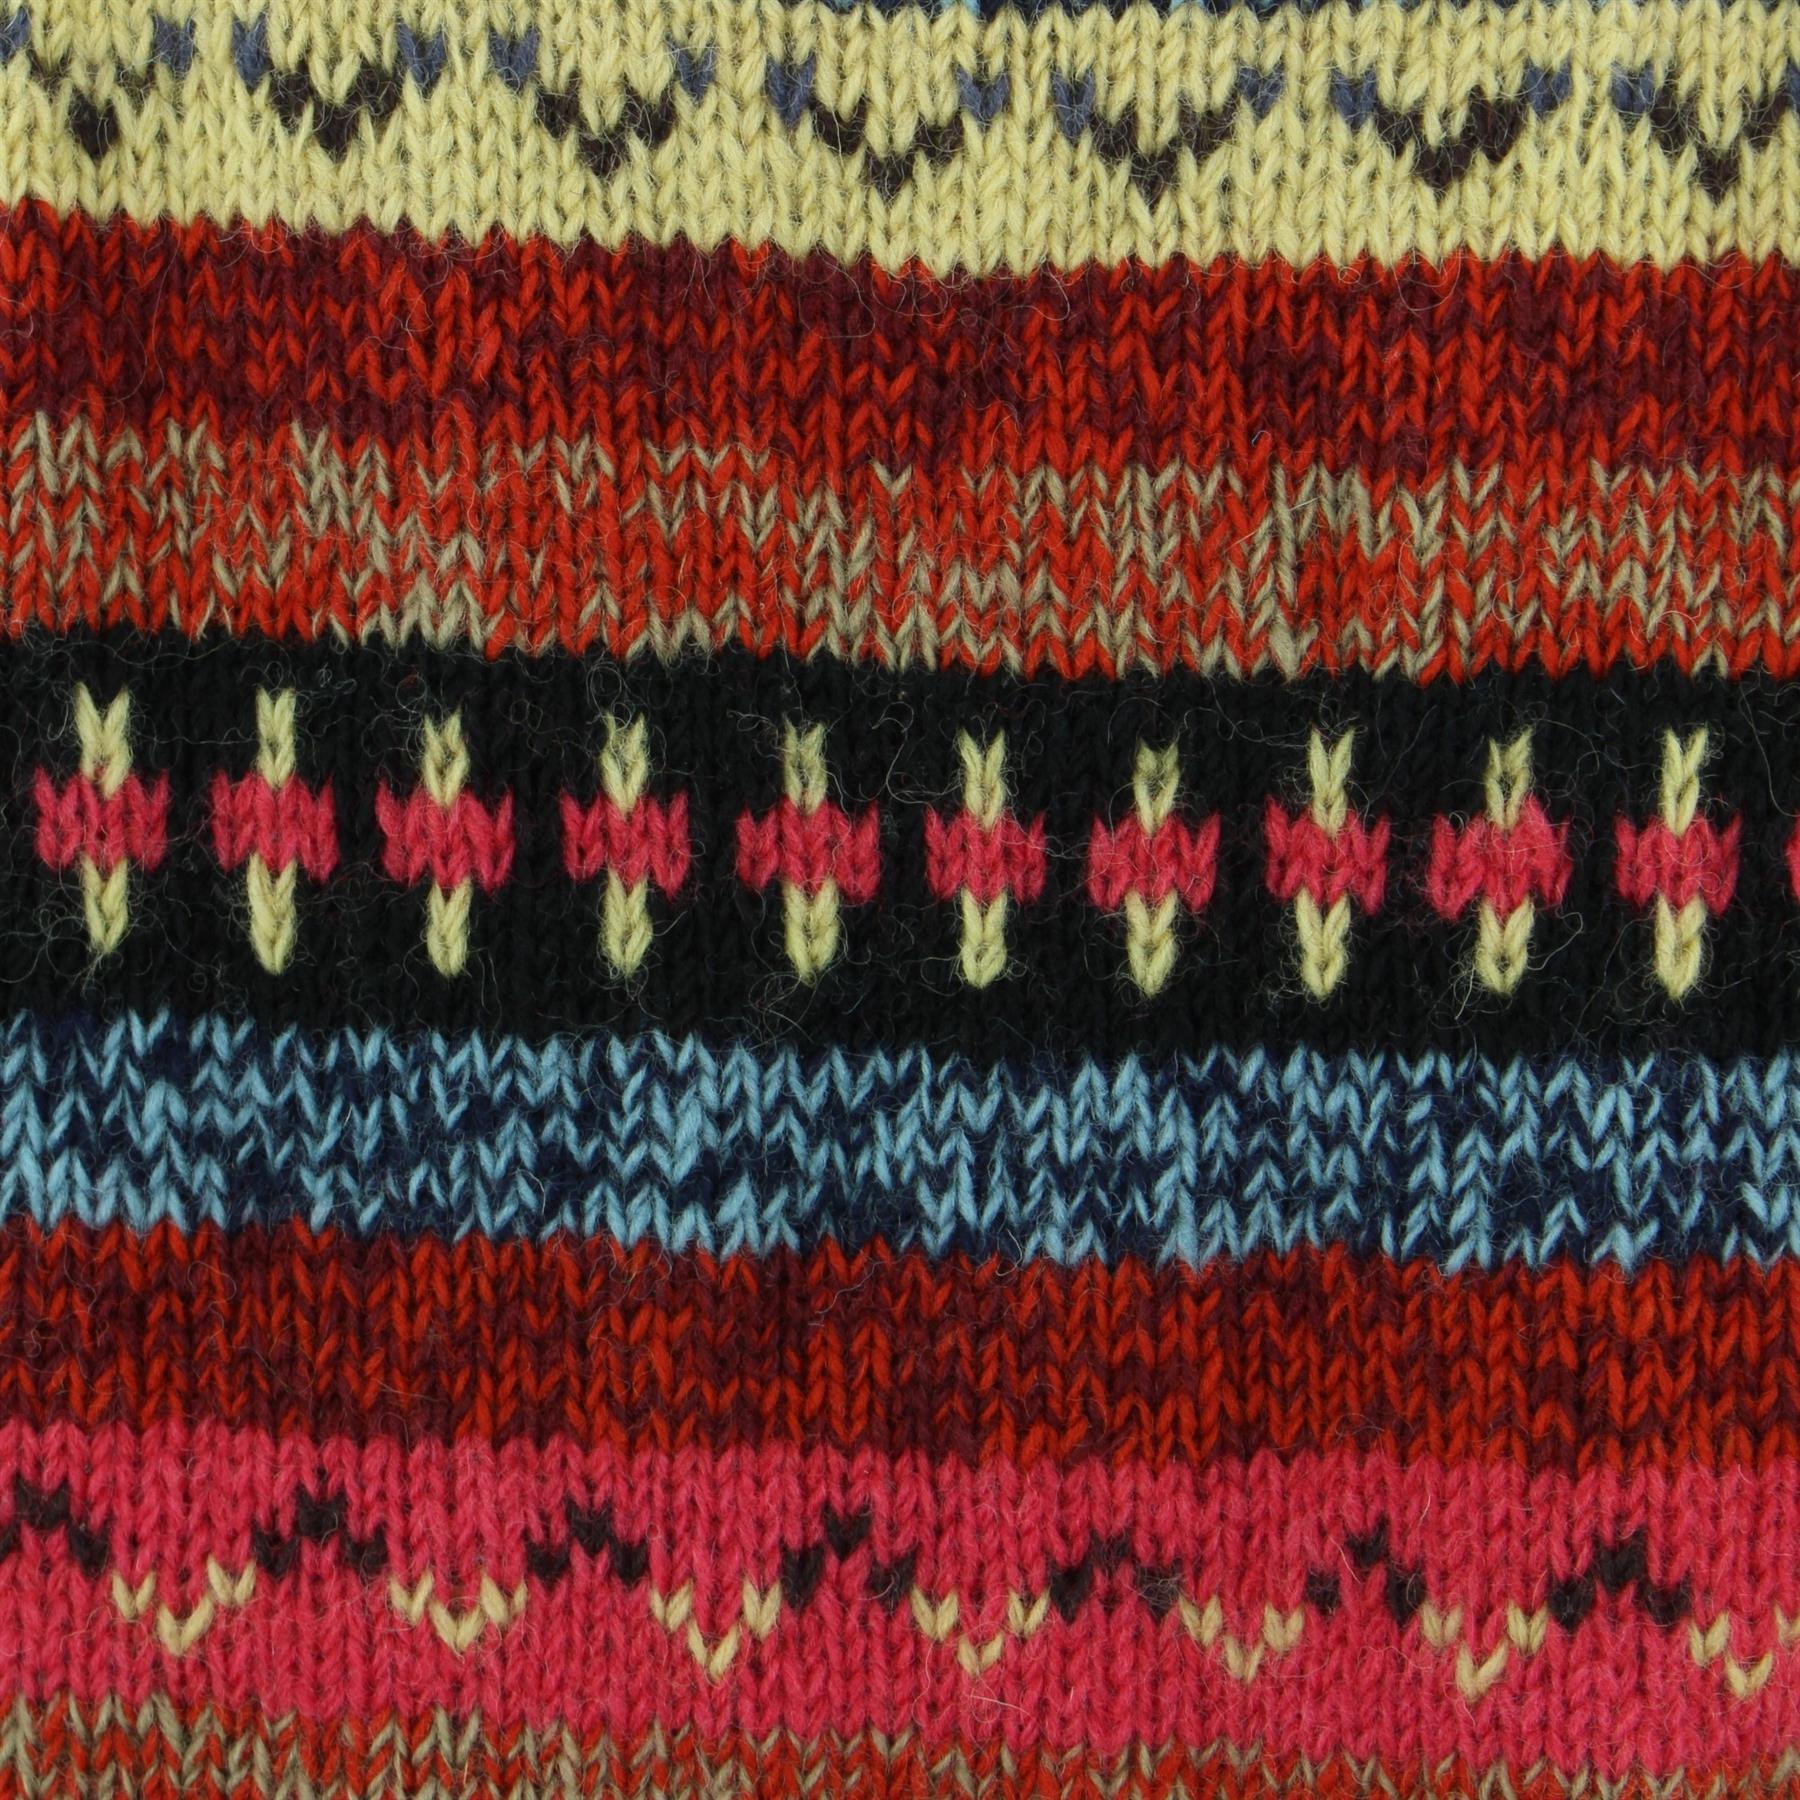 thumbnail 17 - Wool Knit Jumper Sweater Pullover Fairisle Nordic Abstract Warm Nepal Loose